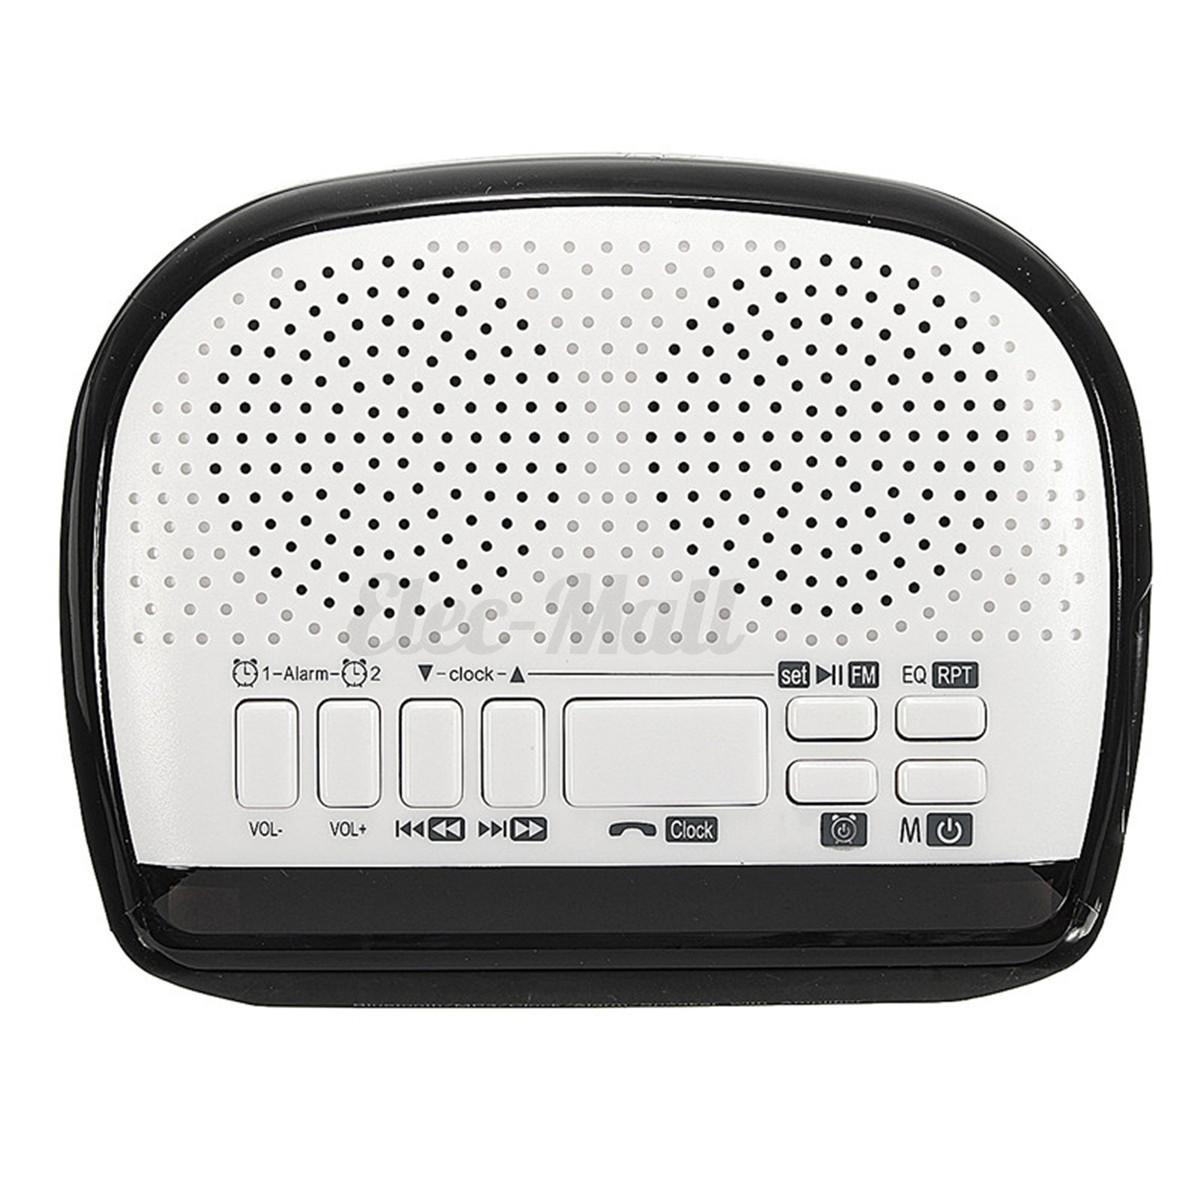 bluetooth digital alarm clock with speaker led display fm radio mp3 player tf. Black Bedroom Furniture Sets. Home Design Ideas